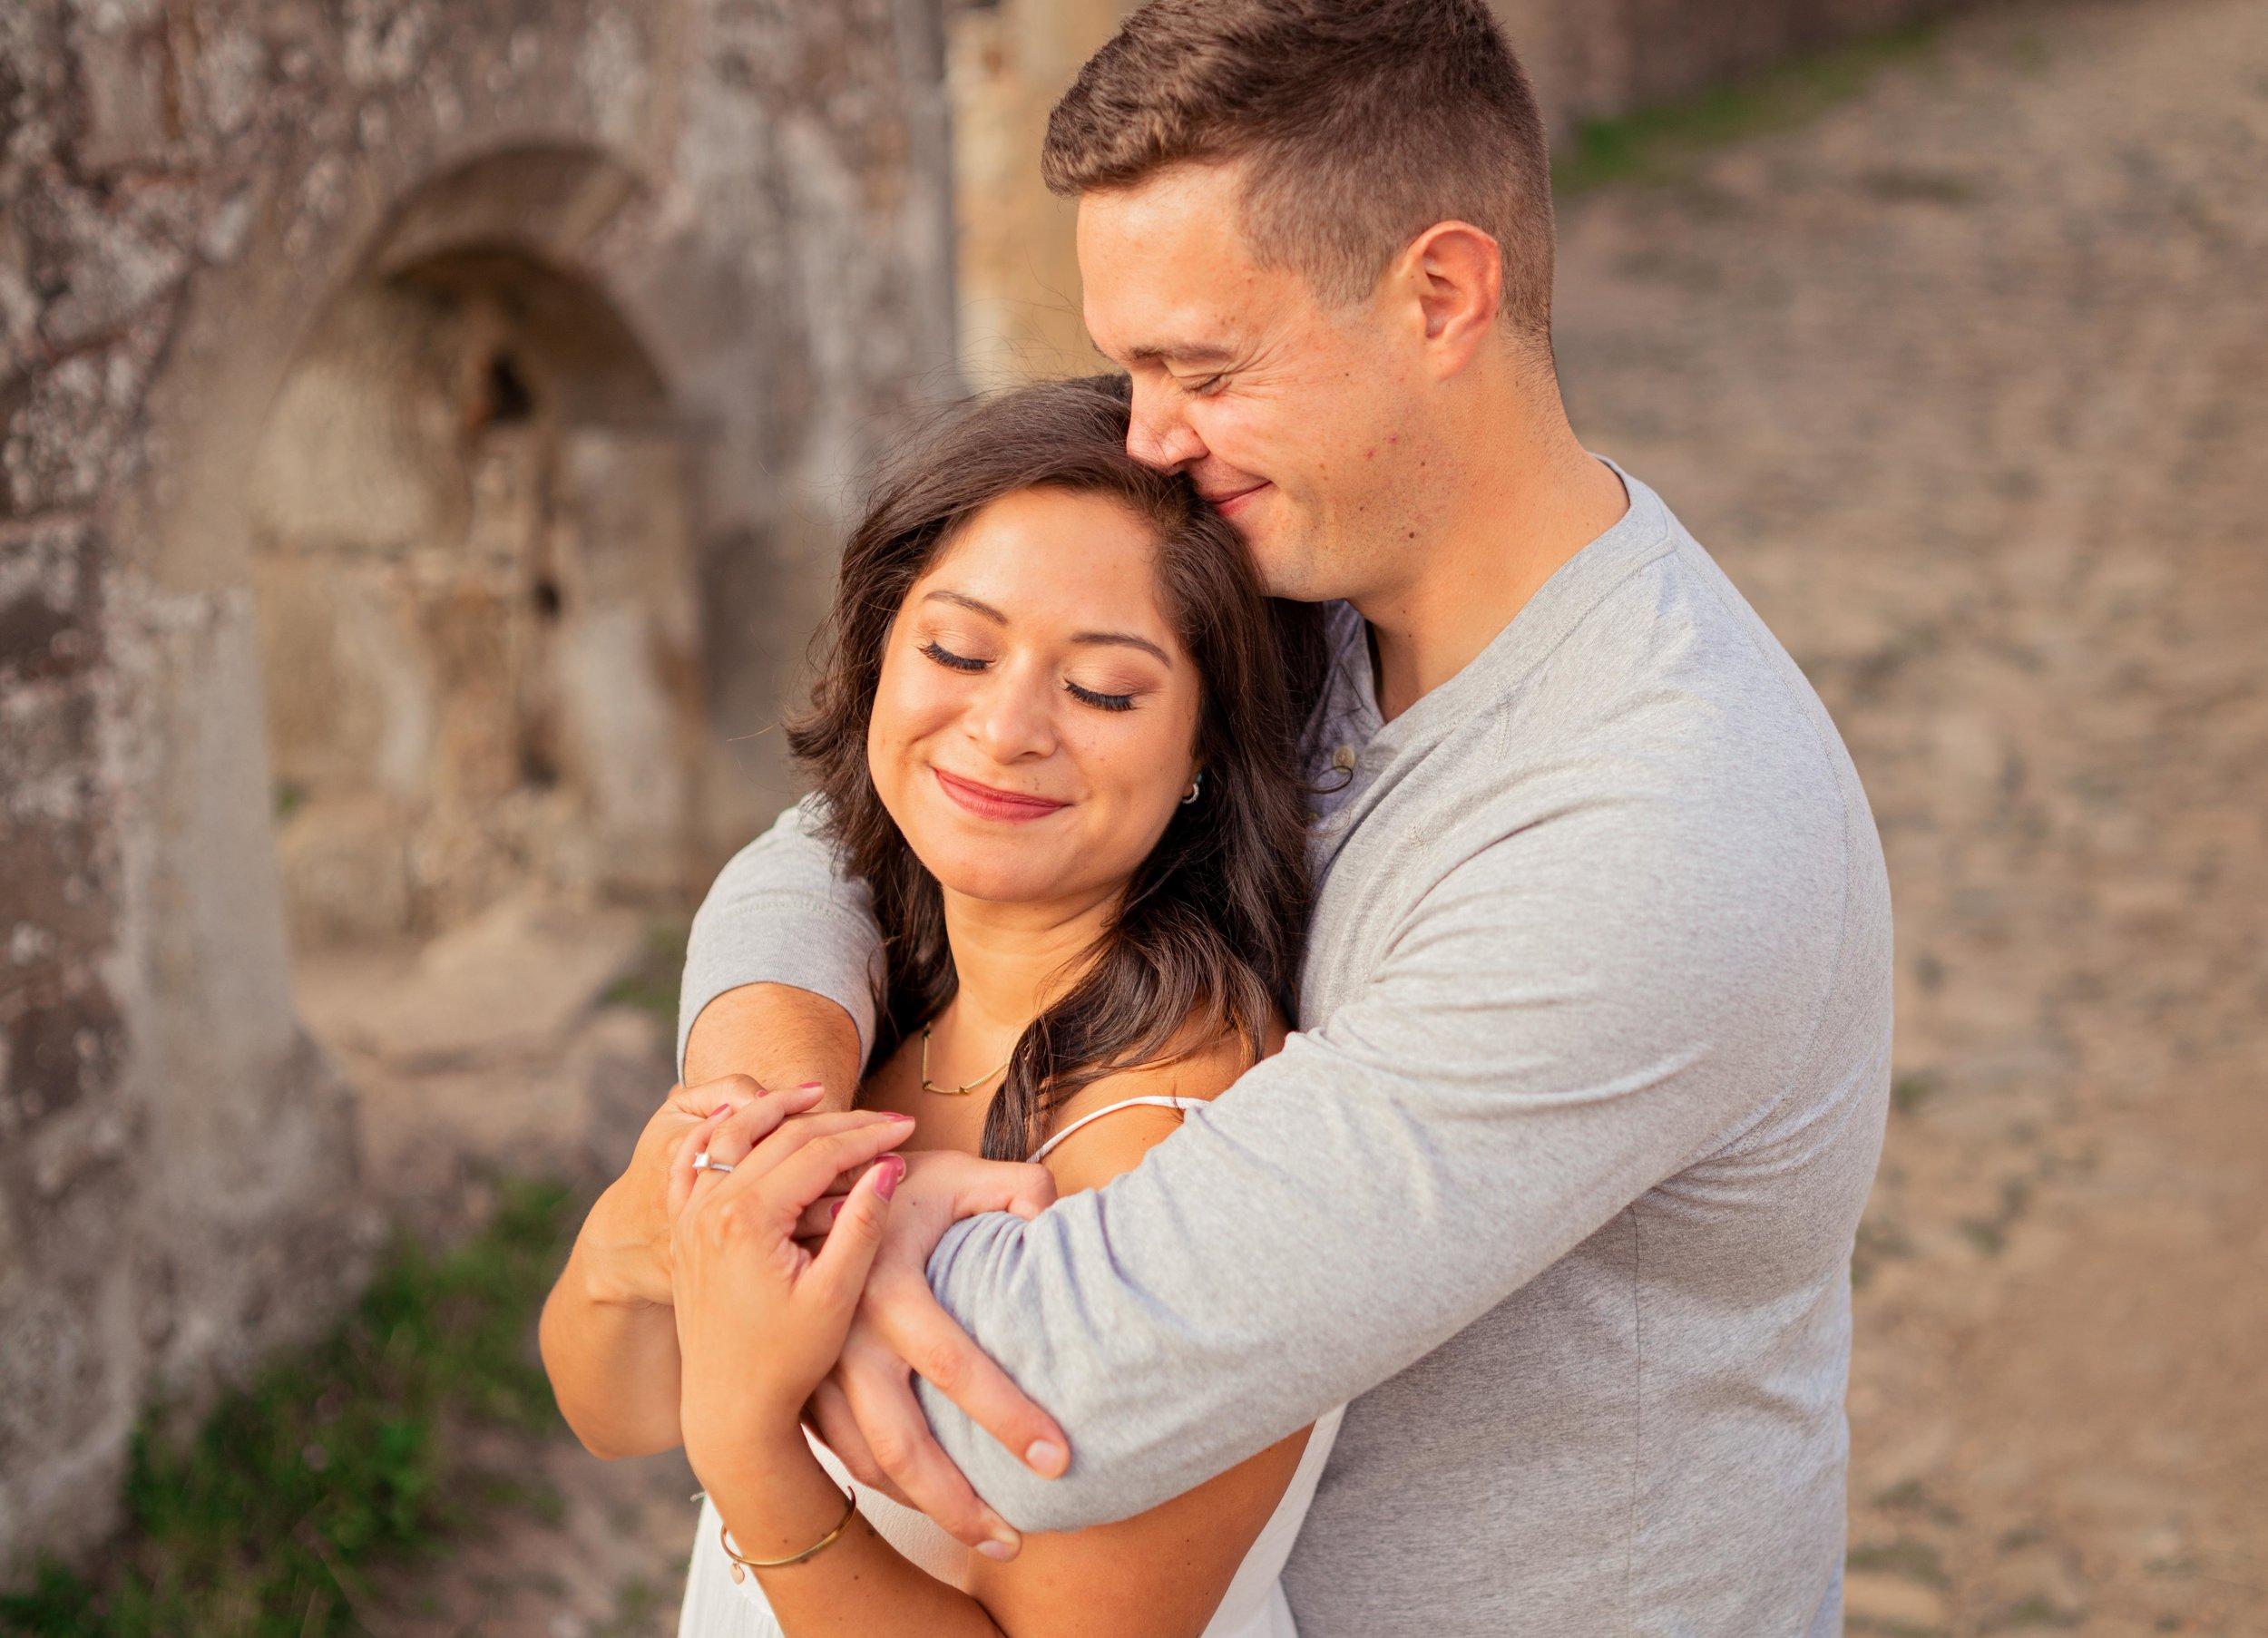 ramstein-kmc-couple-engagement-photographer-lichtenberg-castle-sarah-havens (6).jpg